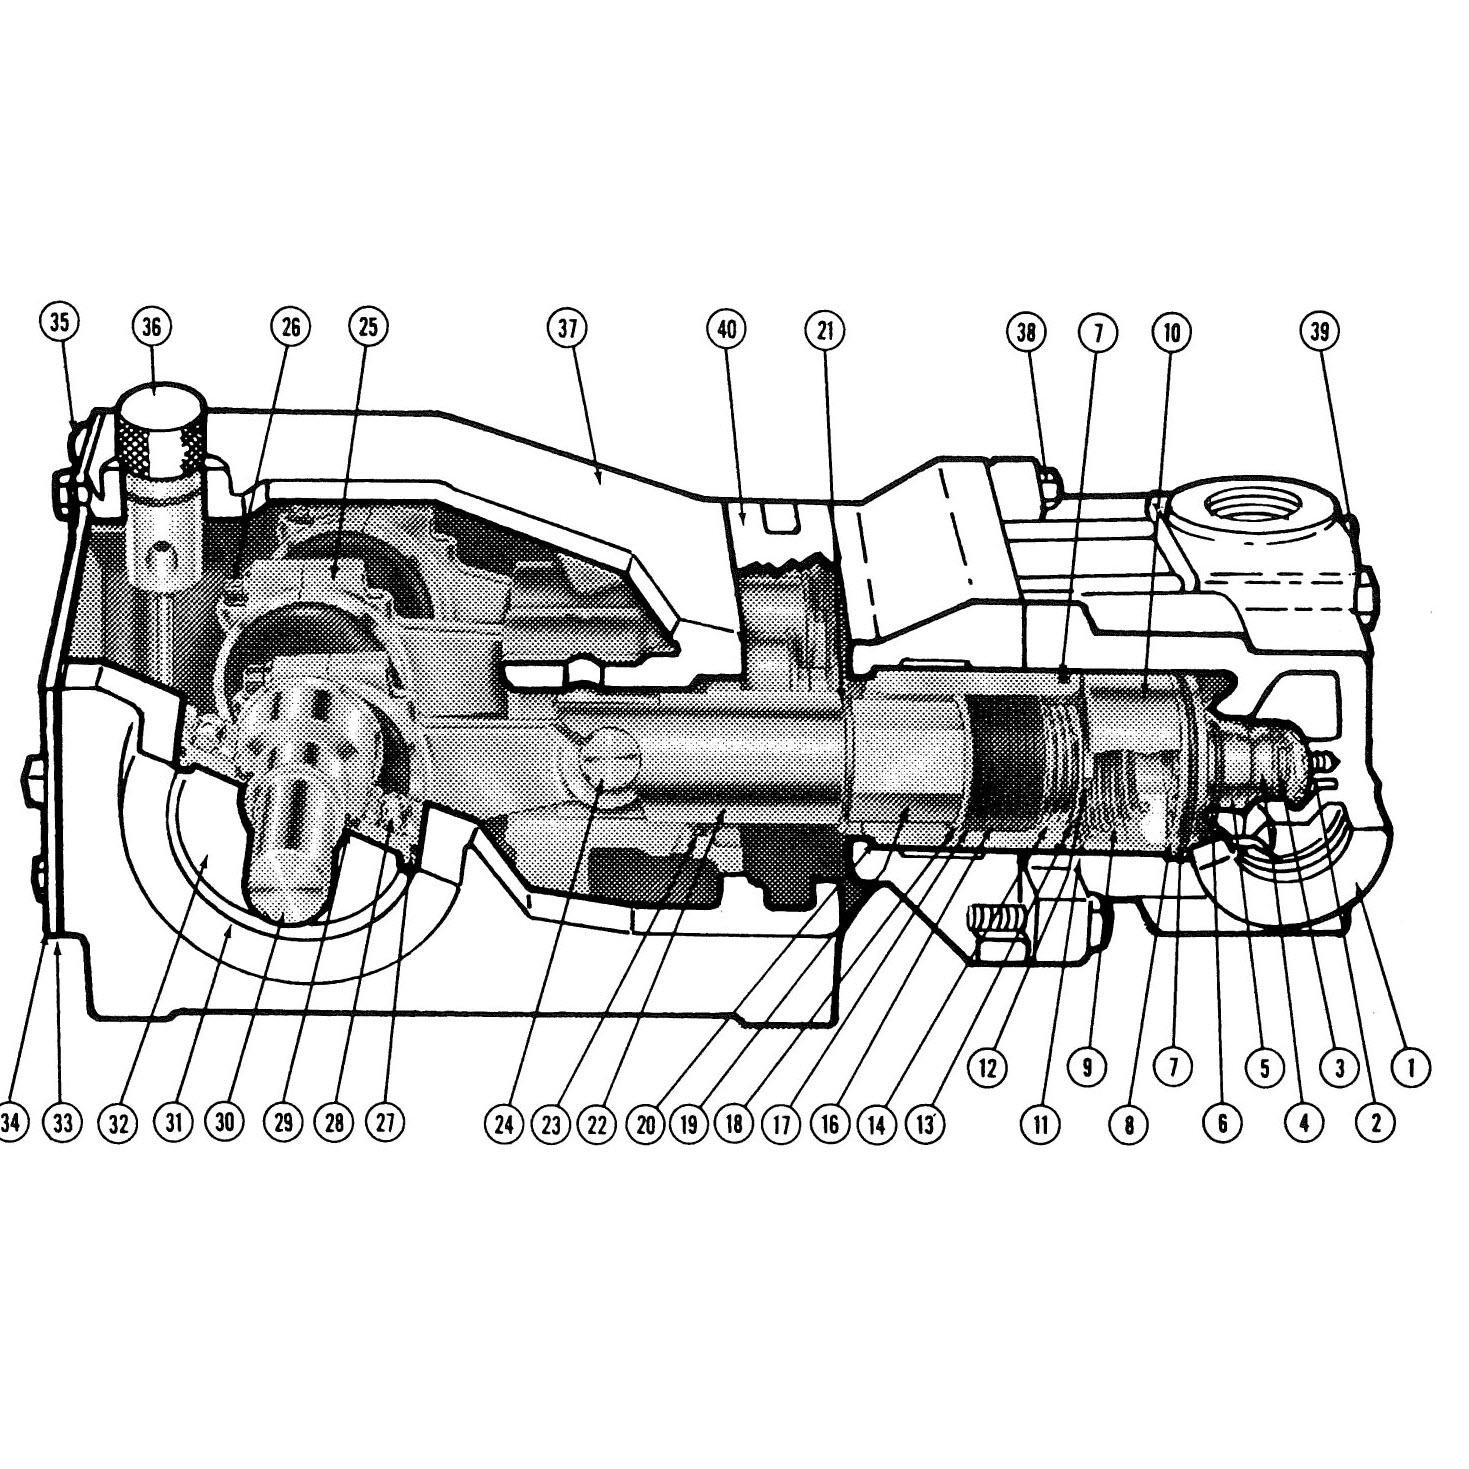 Myers cx10 15av high pressure reciprocating piston pump sprayer parts list pooptronica